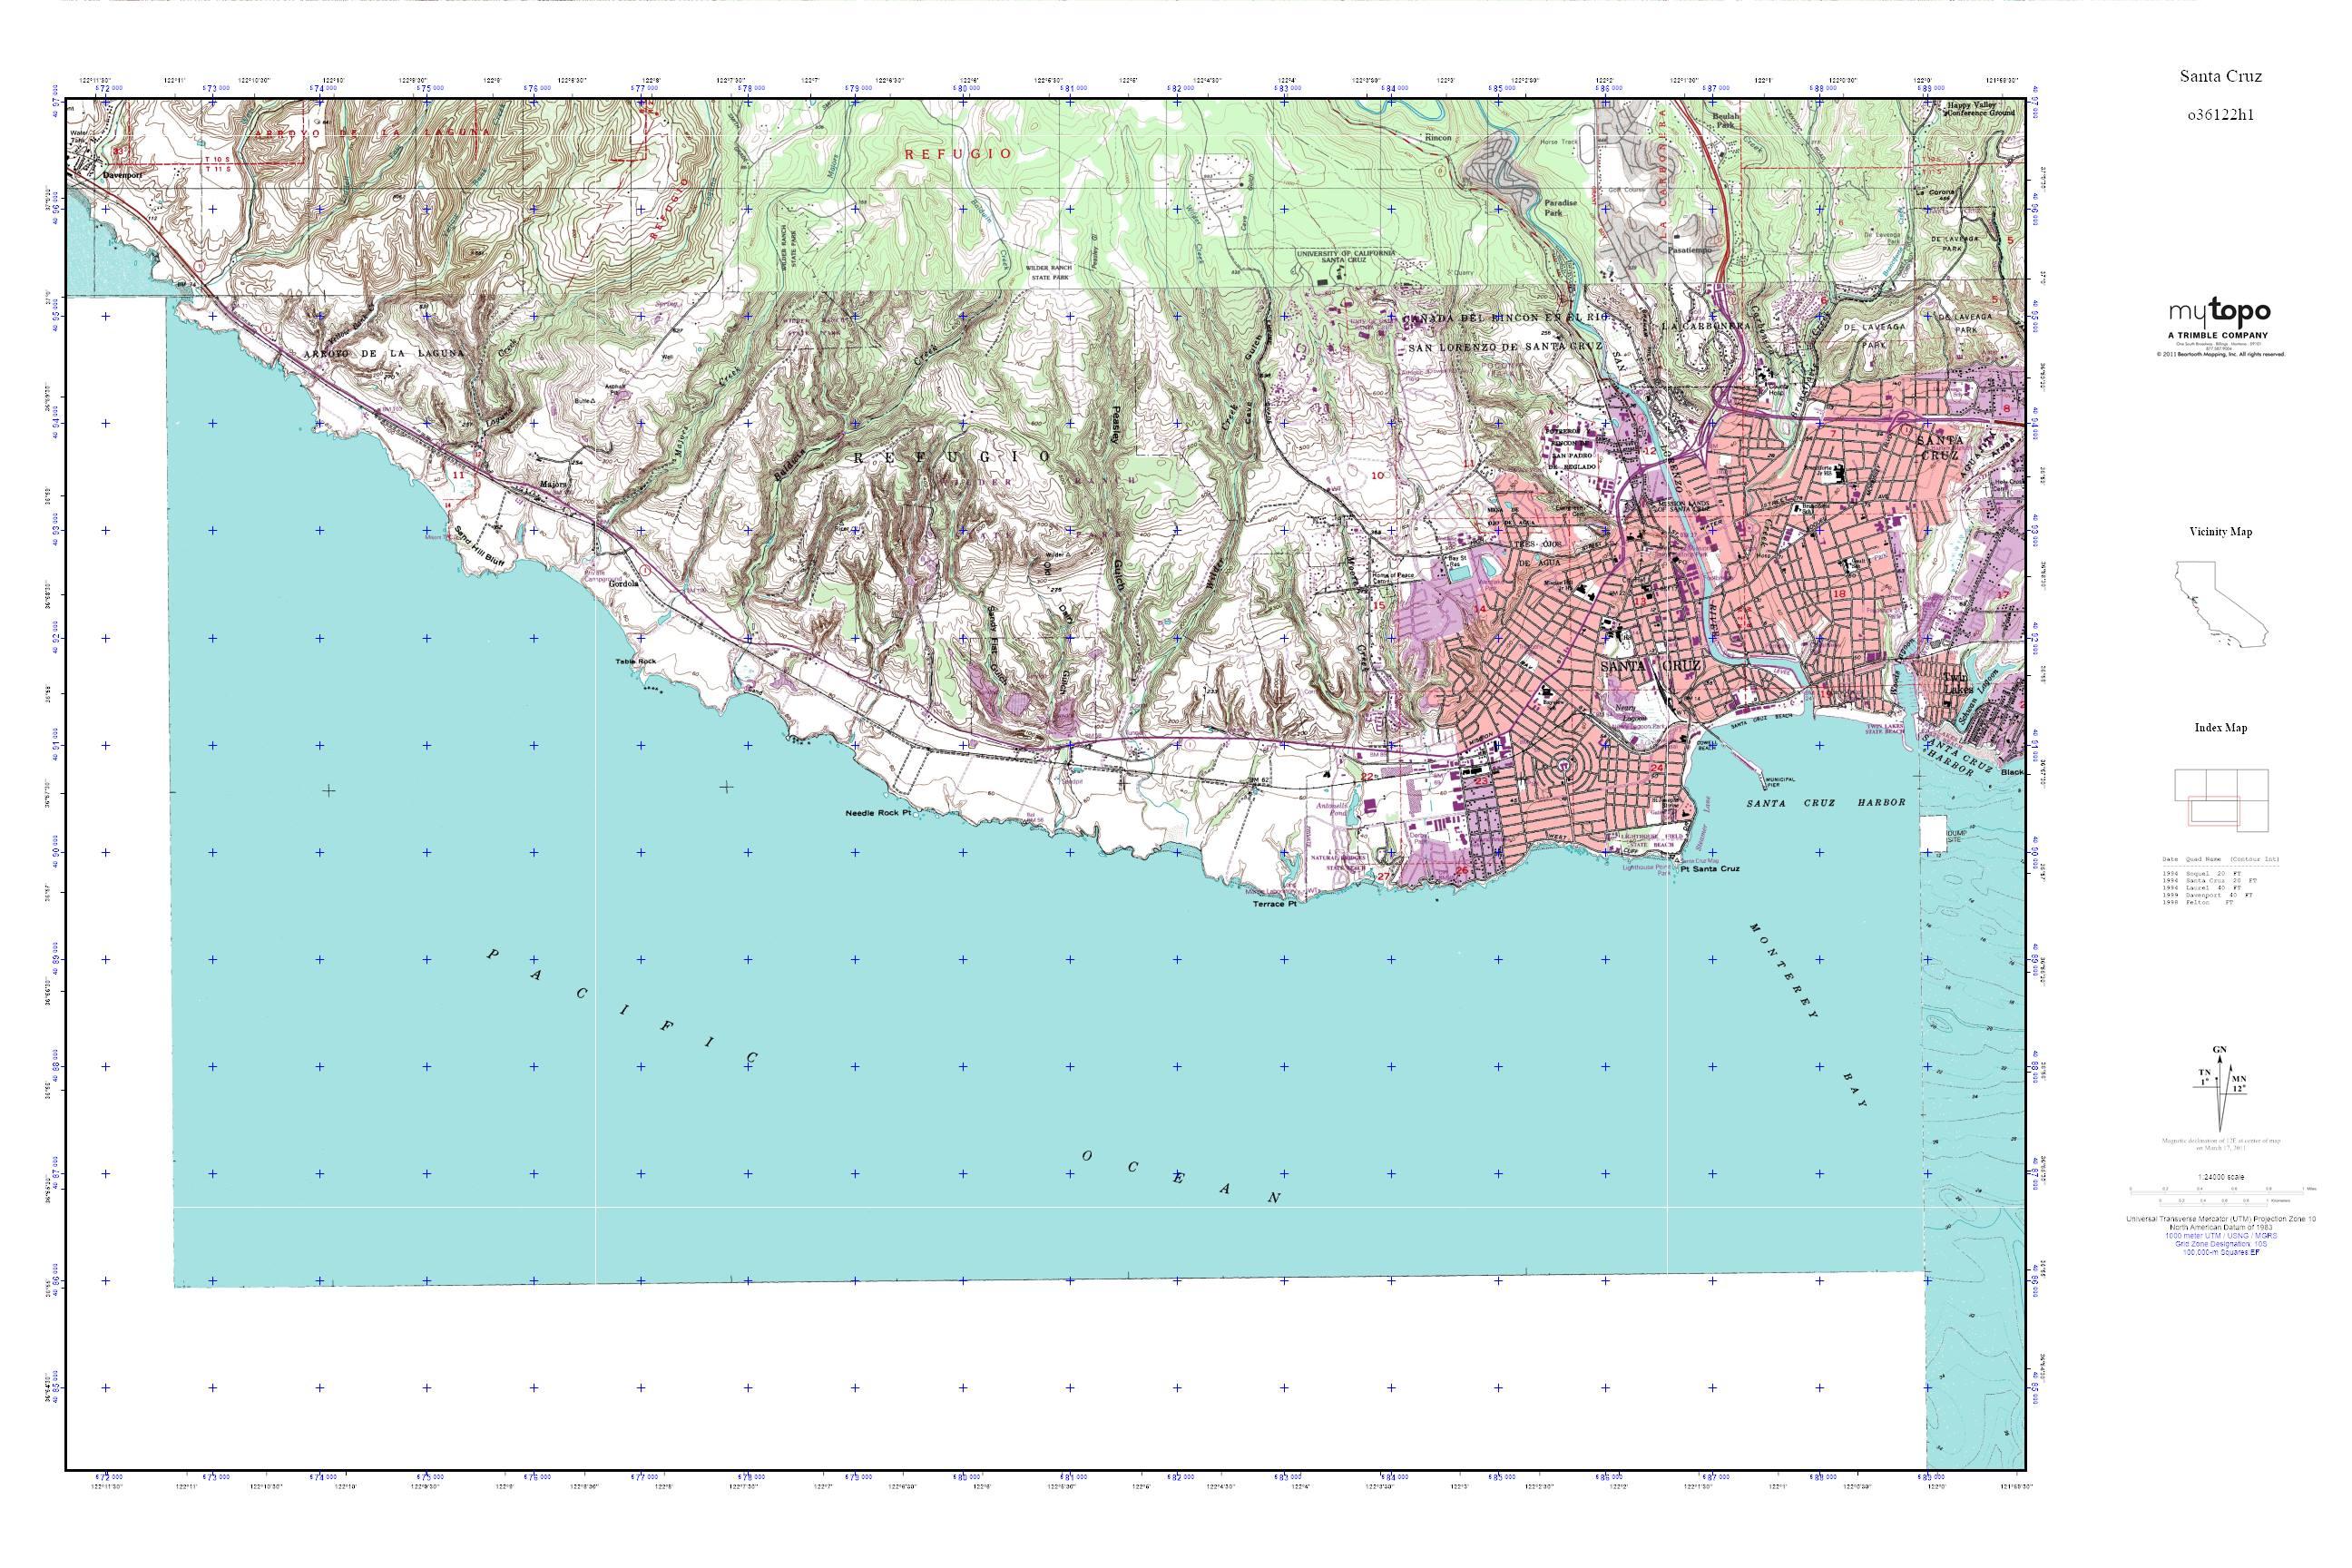 Mytopo Santa Cruz California Usgs Quad Topo Map